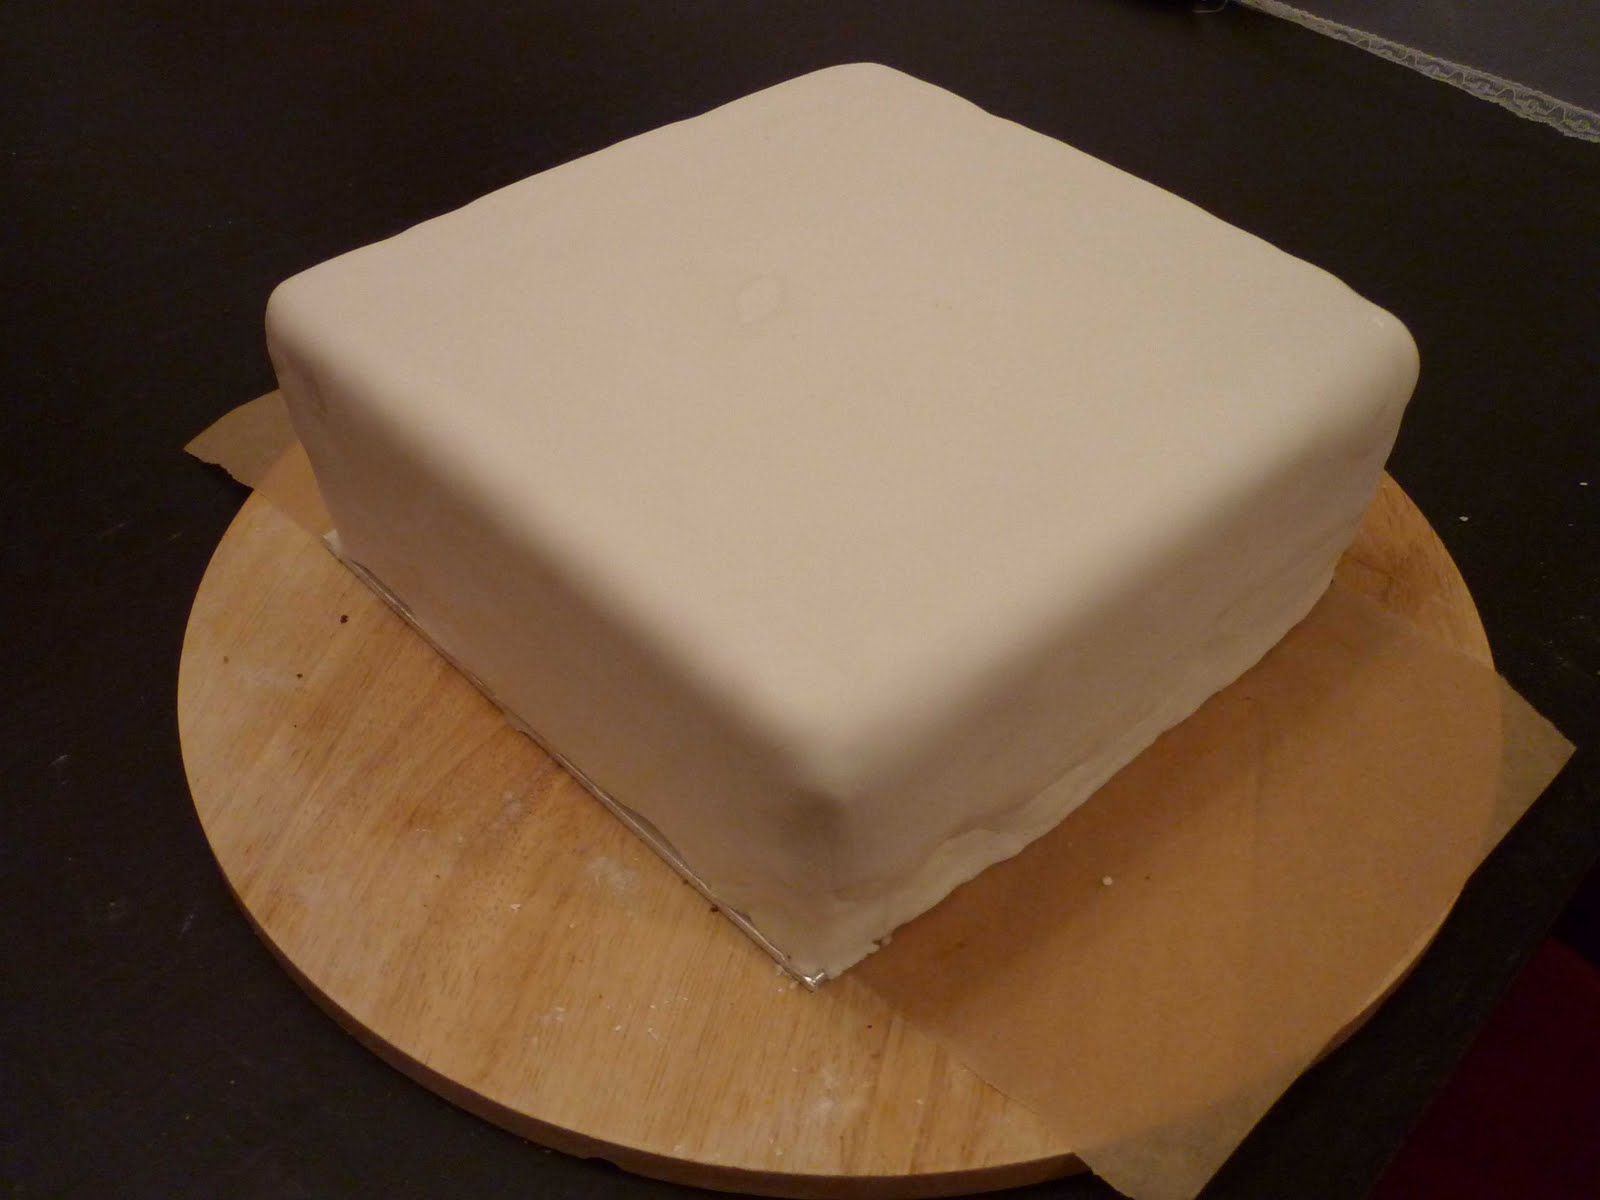 Inch Cake Square Chocolate Cake Recipe